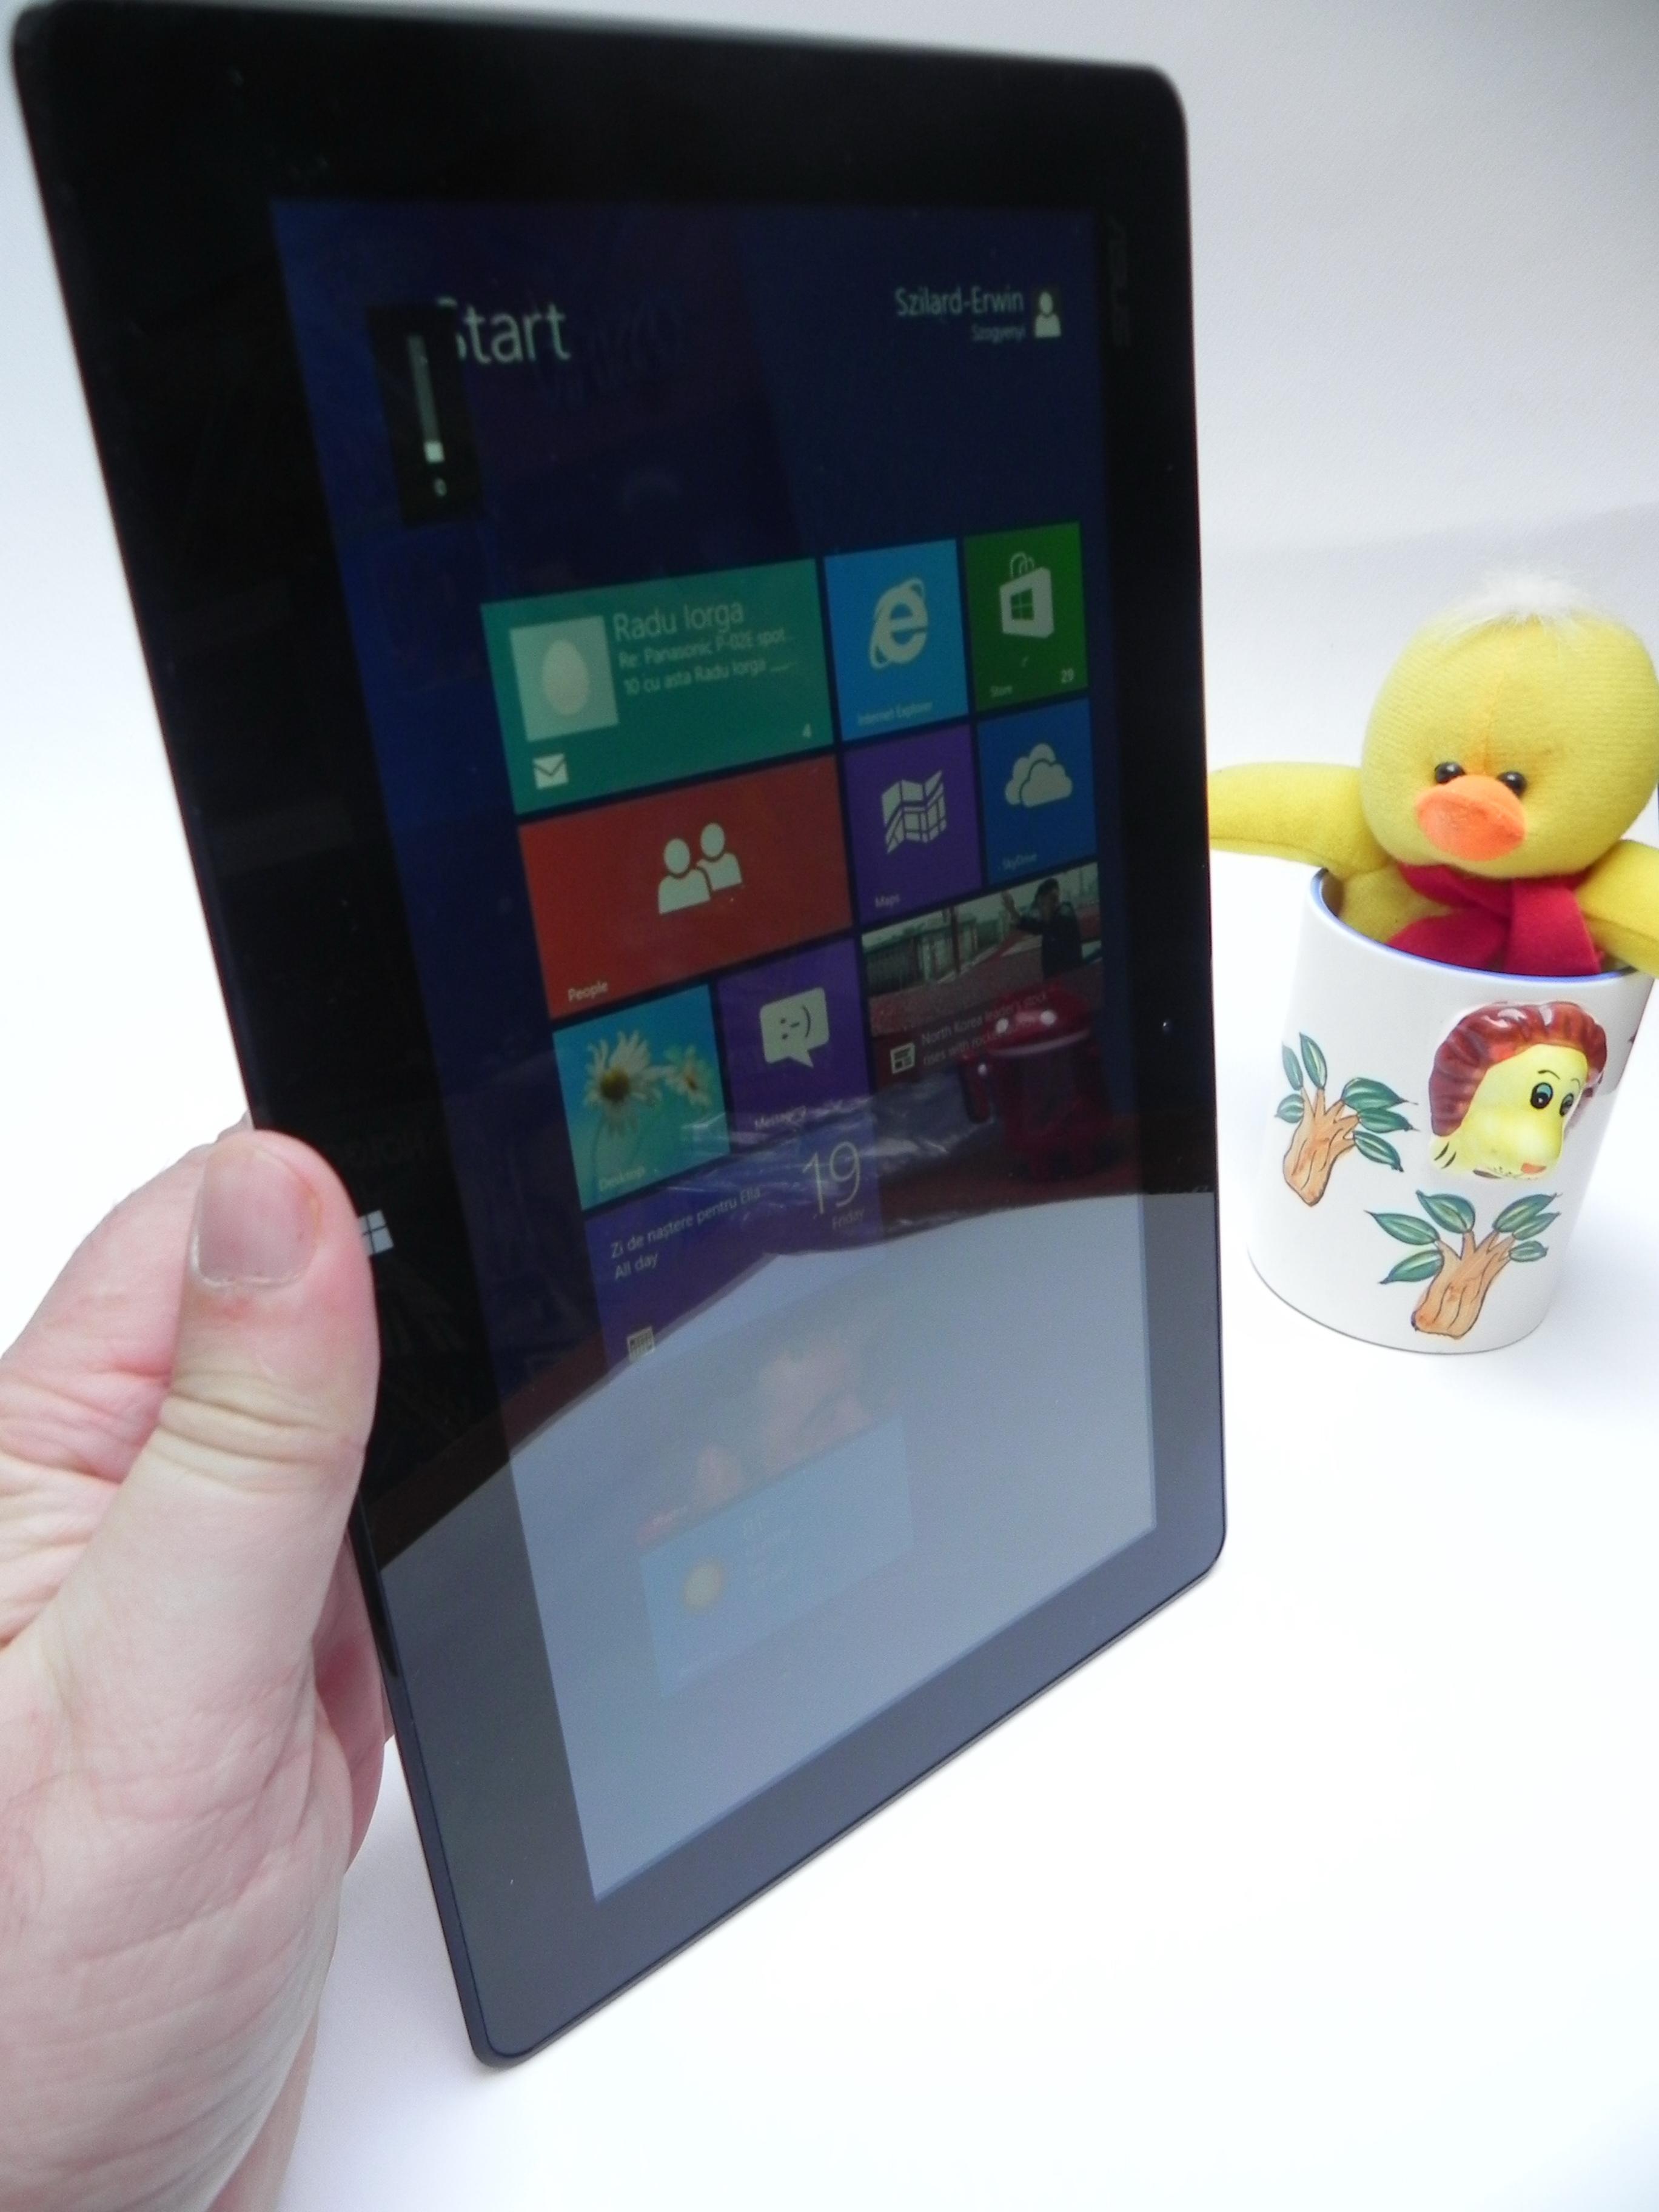 ASUS-VivoTab-Smart-review-Tablet-News-com_10 - Tablet News